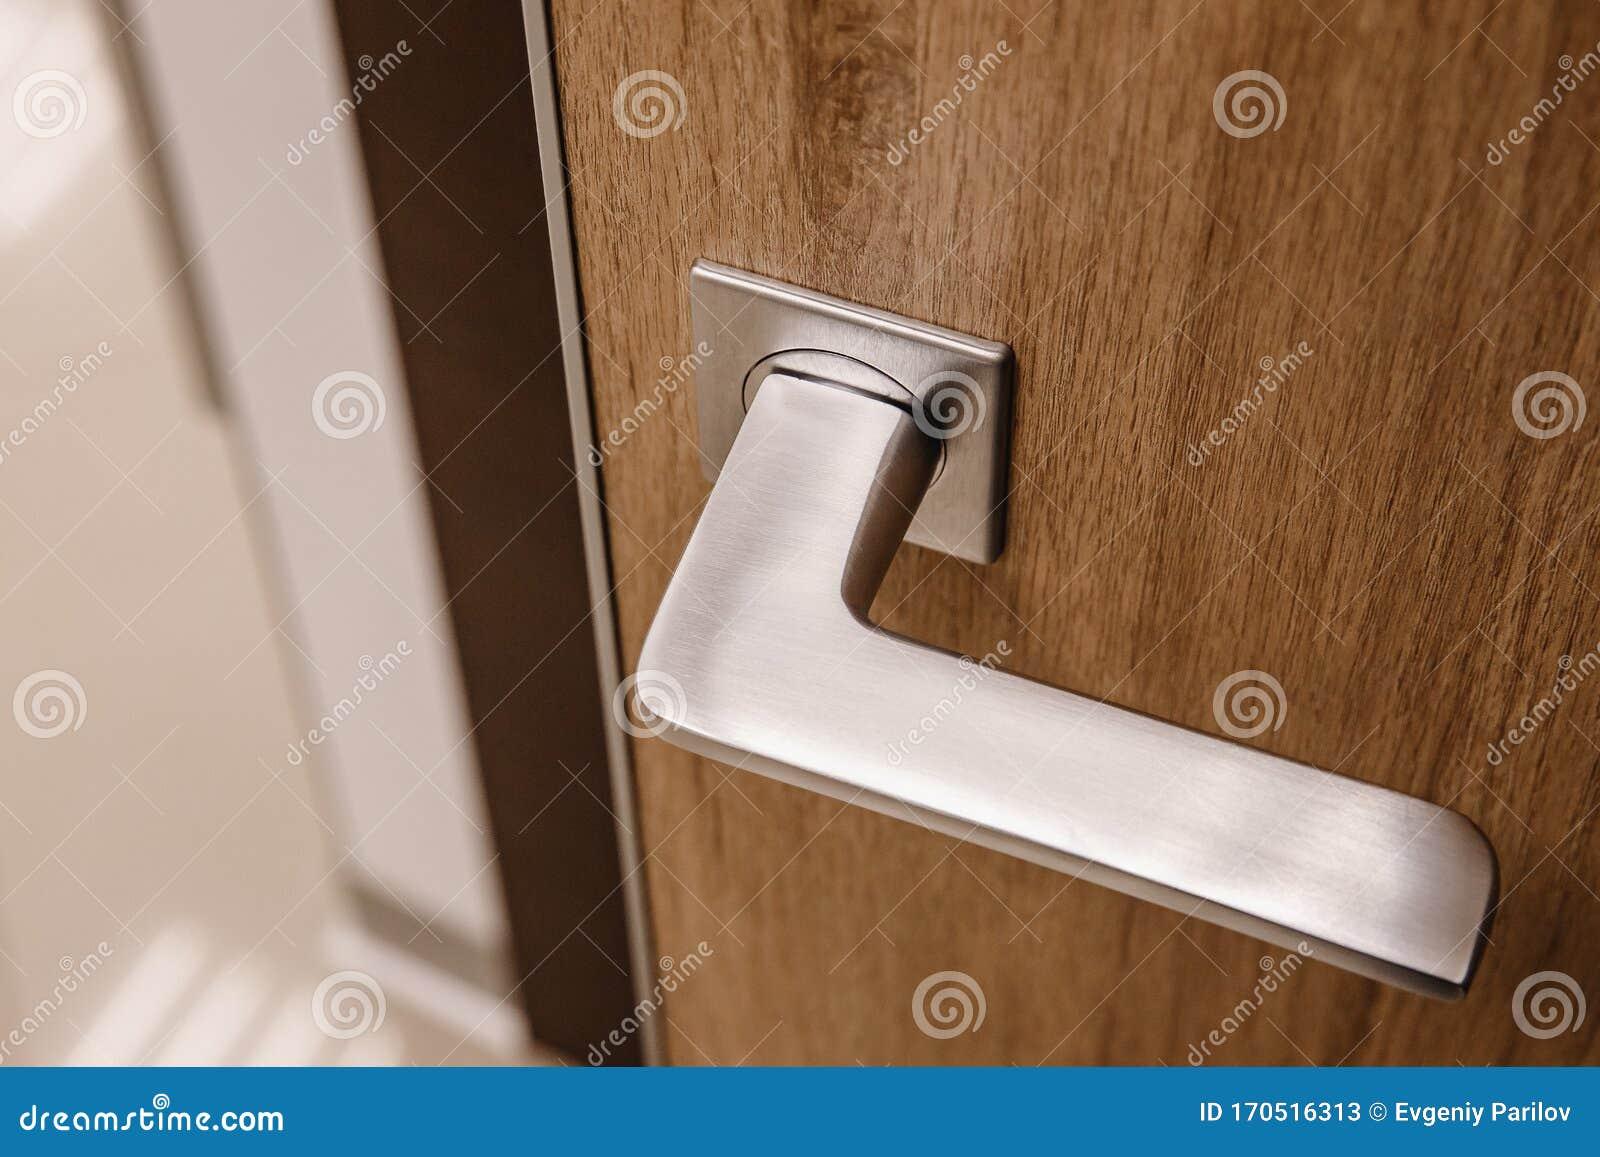 Metal Doors Knob Handle On Modern Interior Stock Image Image Of Keyhole Door 170516313